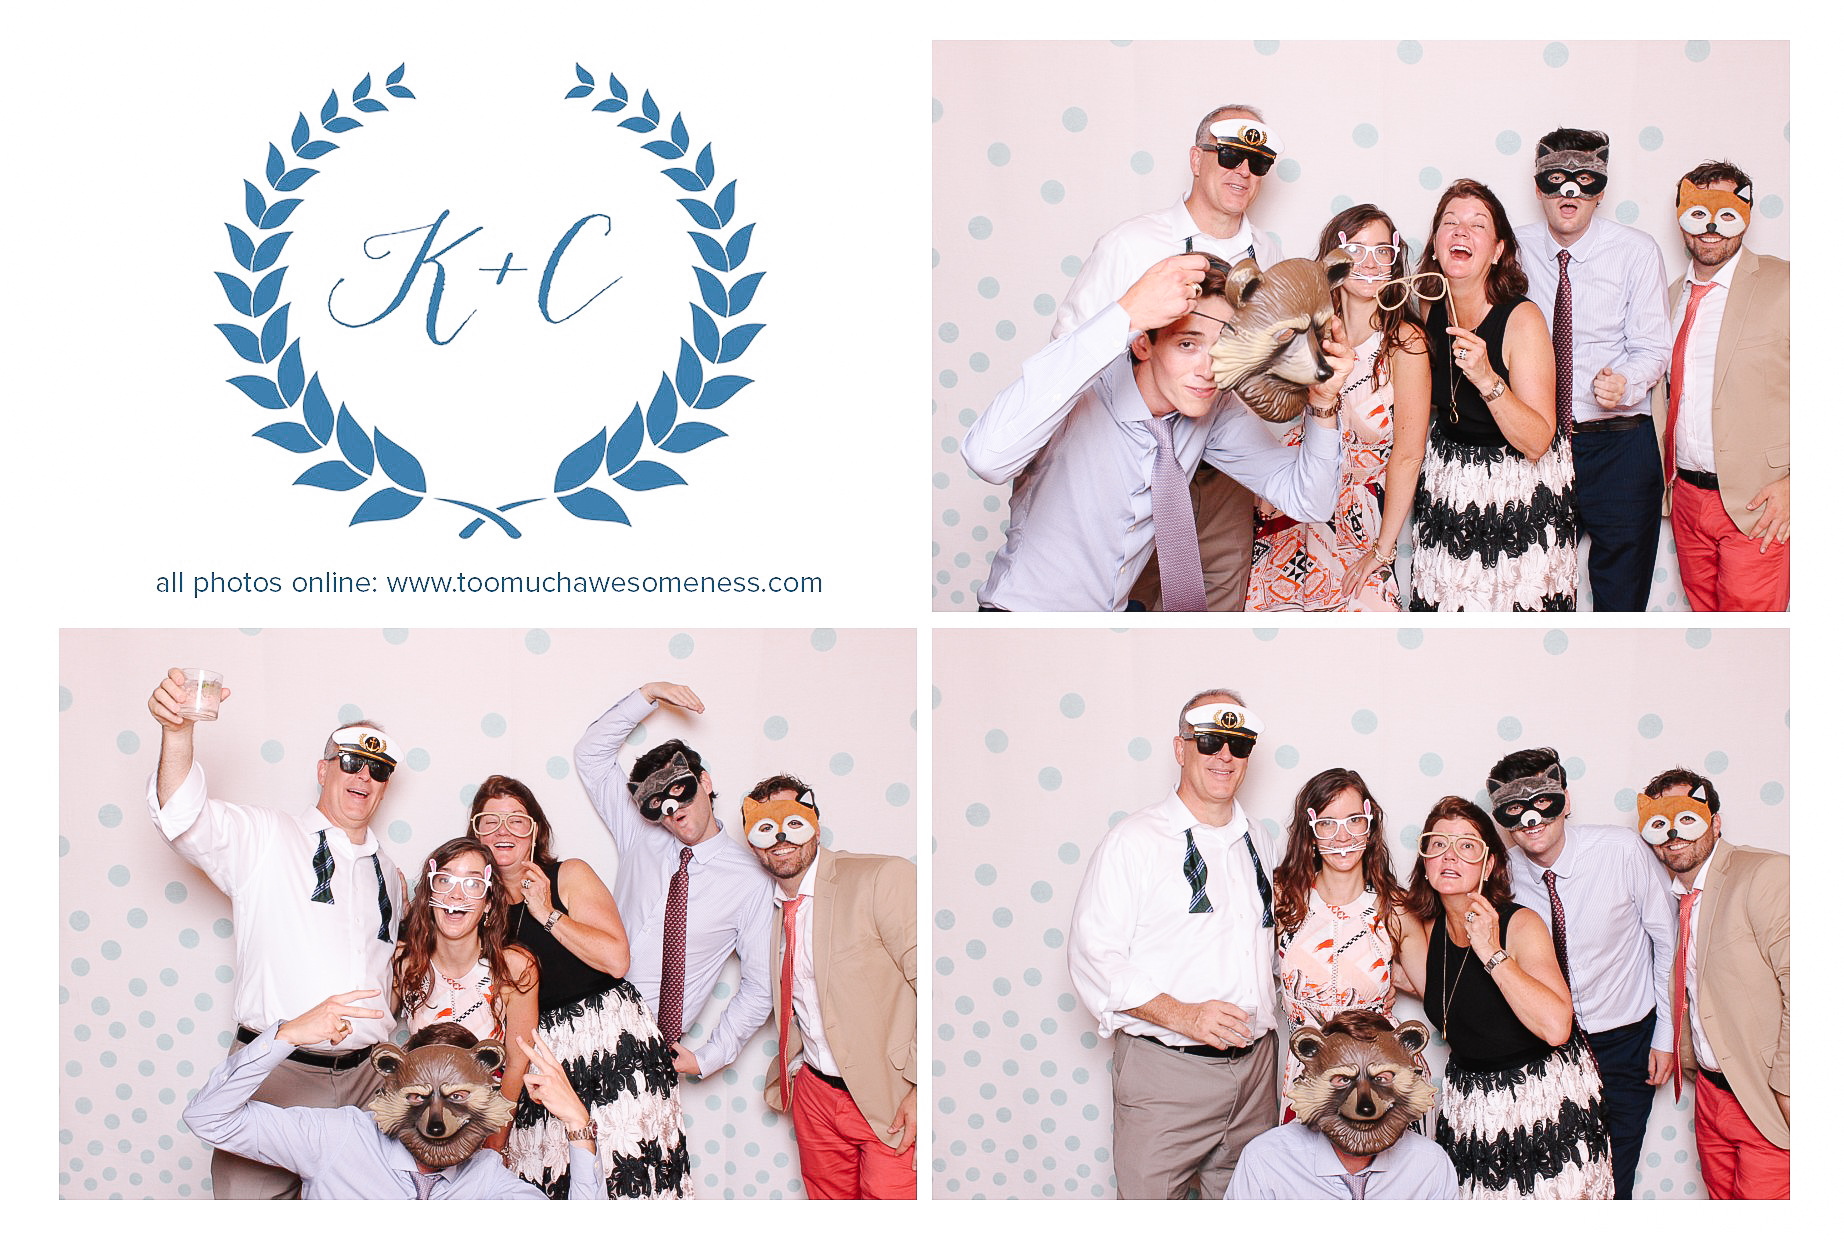 0132 Cleveland Wedding Photobooth too much awesomeness.jpg